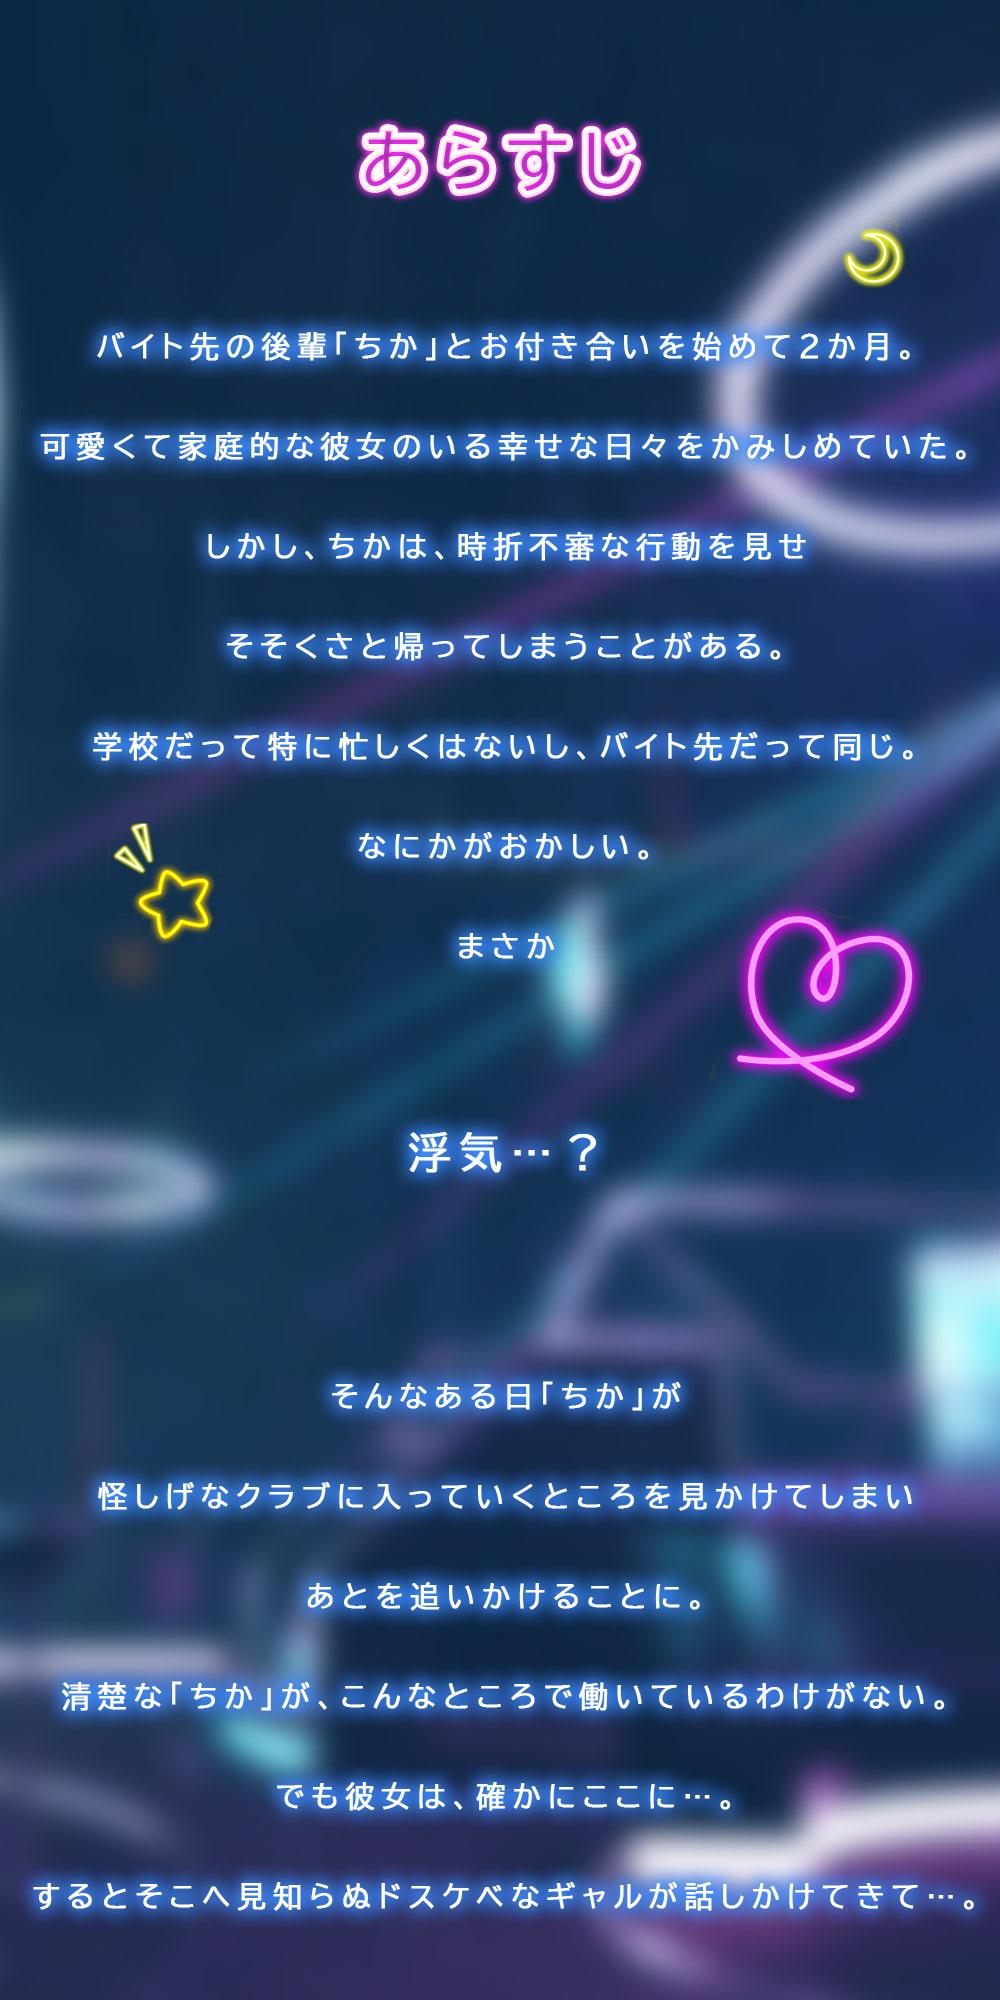 RJ328352 ぬるまん★誘惑ナイト~ぼくの彼女の裏バイト~ [20210527]